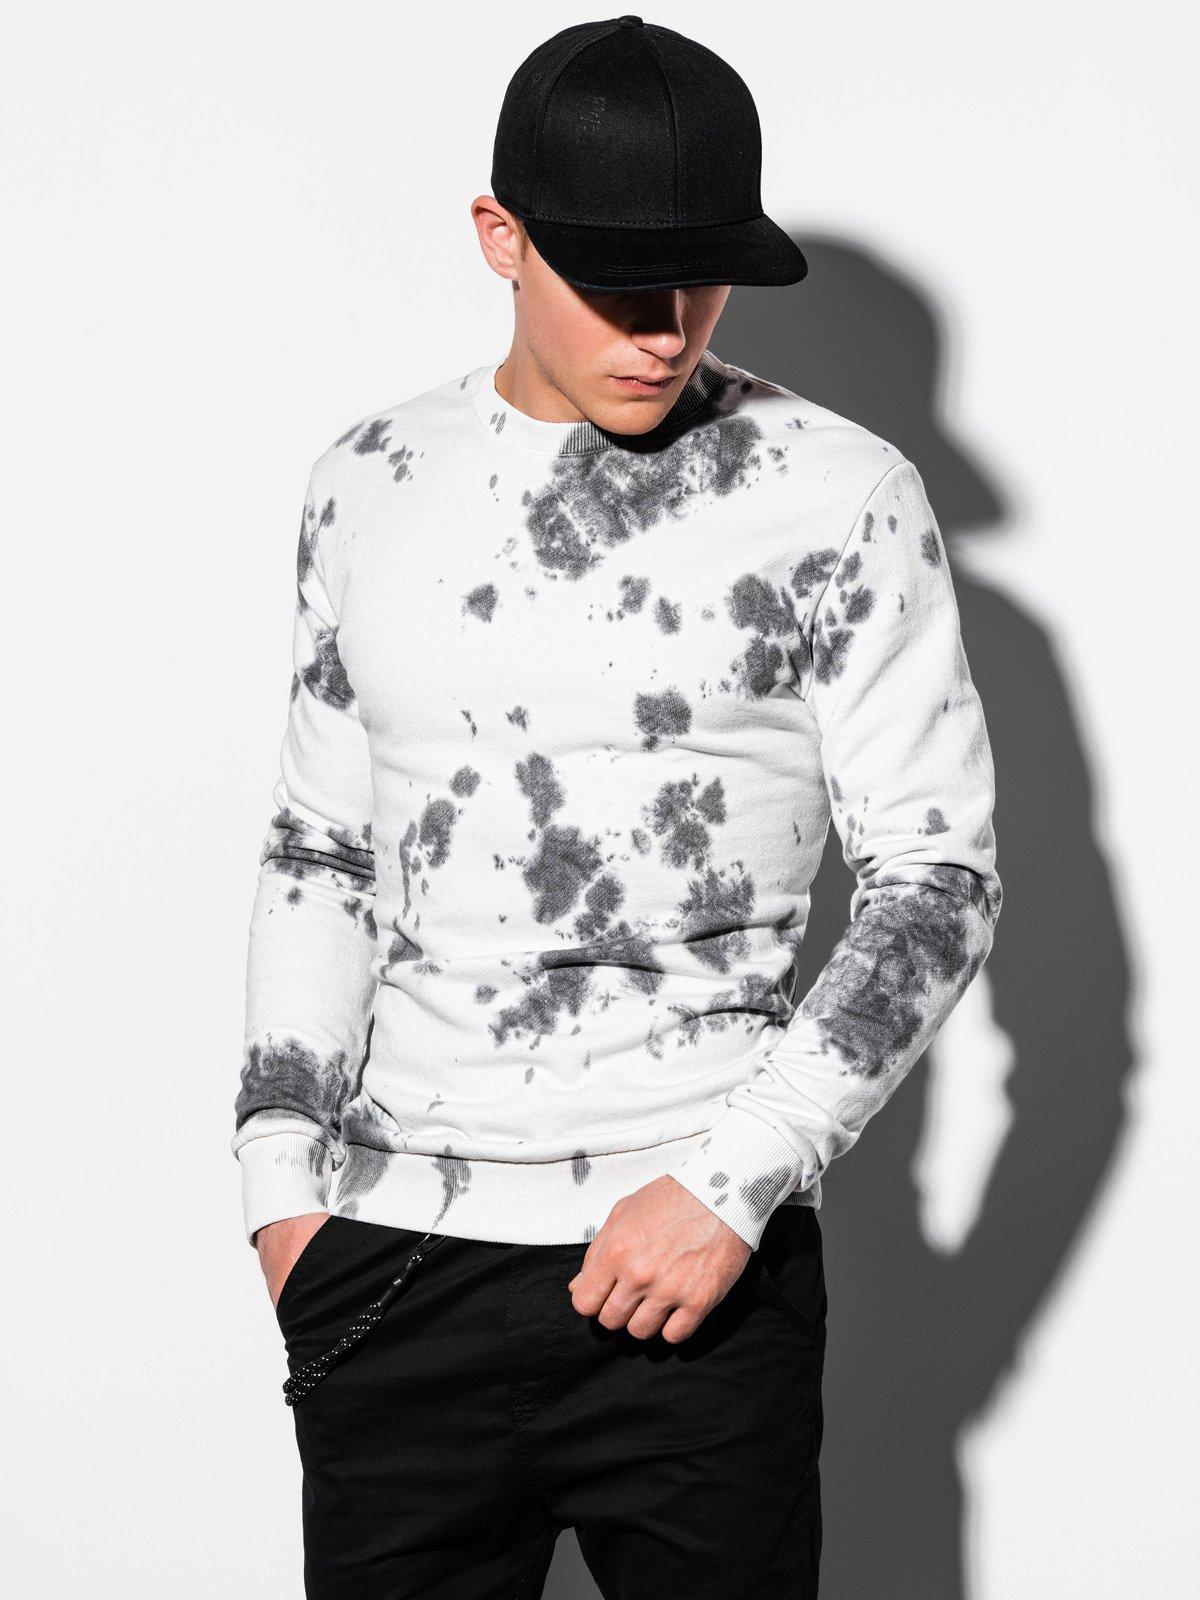 Bluza męska bezkaptura znadrukiem B1044 - biała